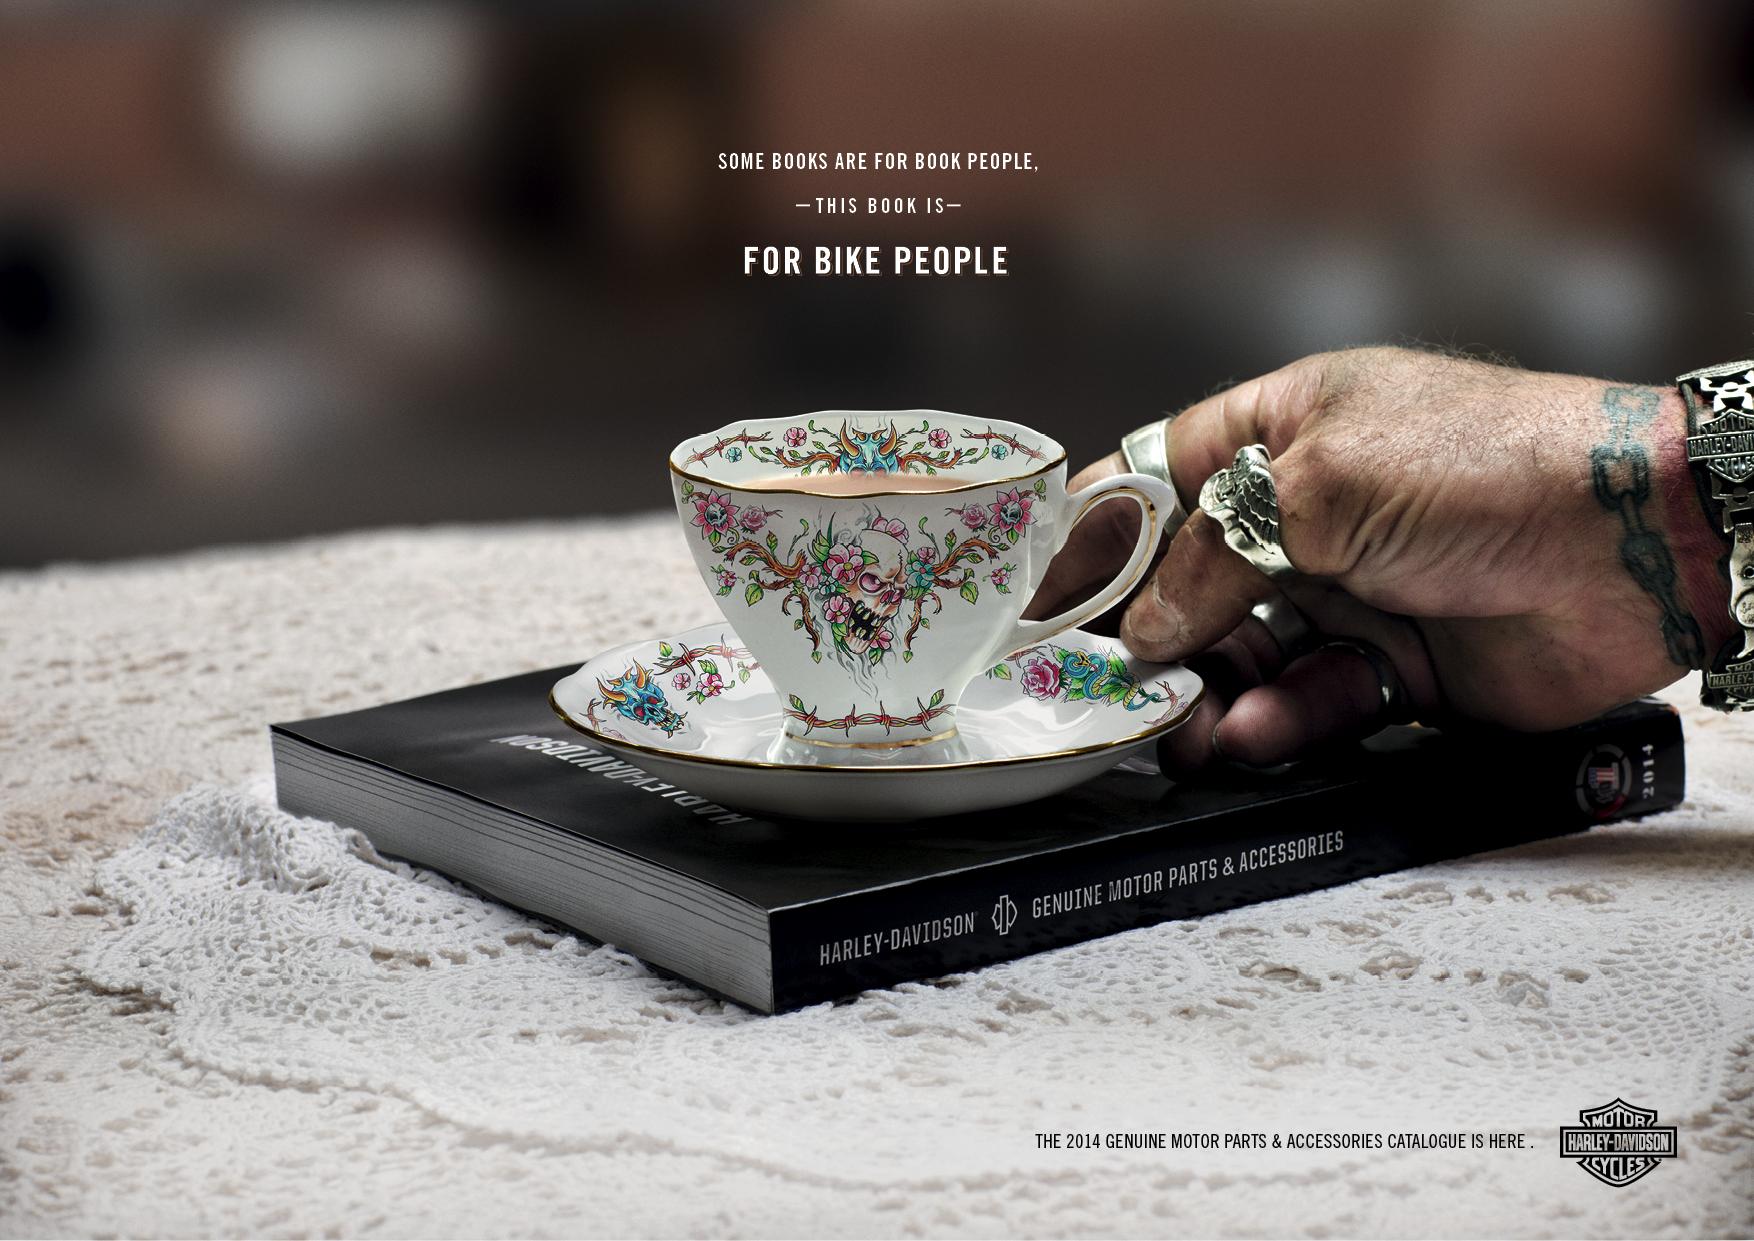 Harley Davidson Advertising: Print Ad: Harley Davidson: Book Club